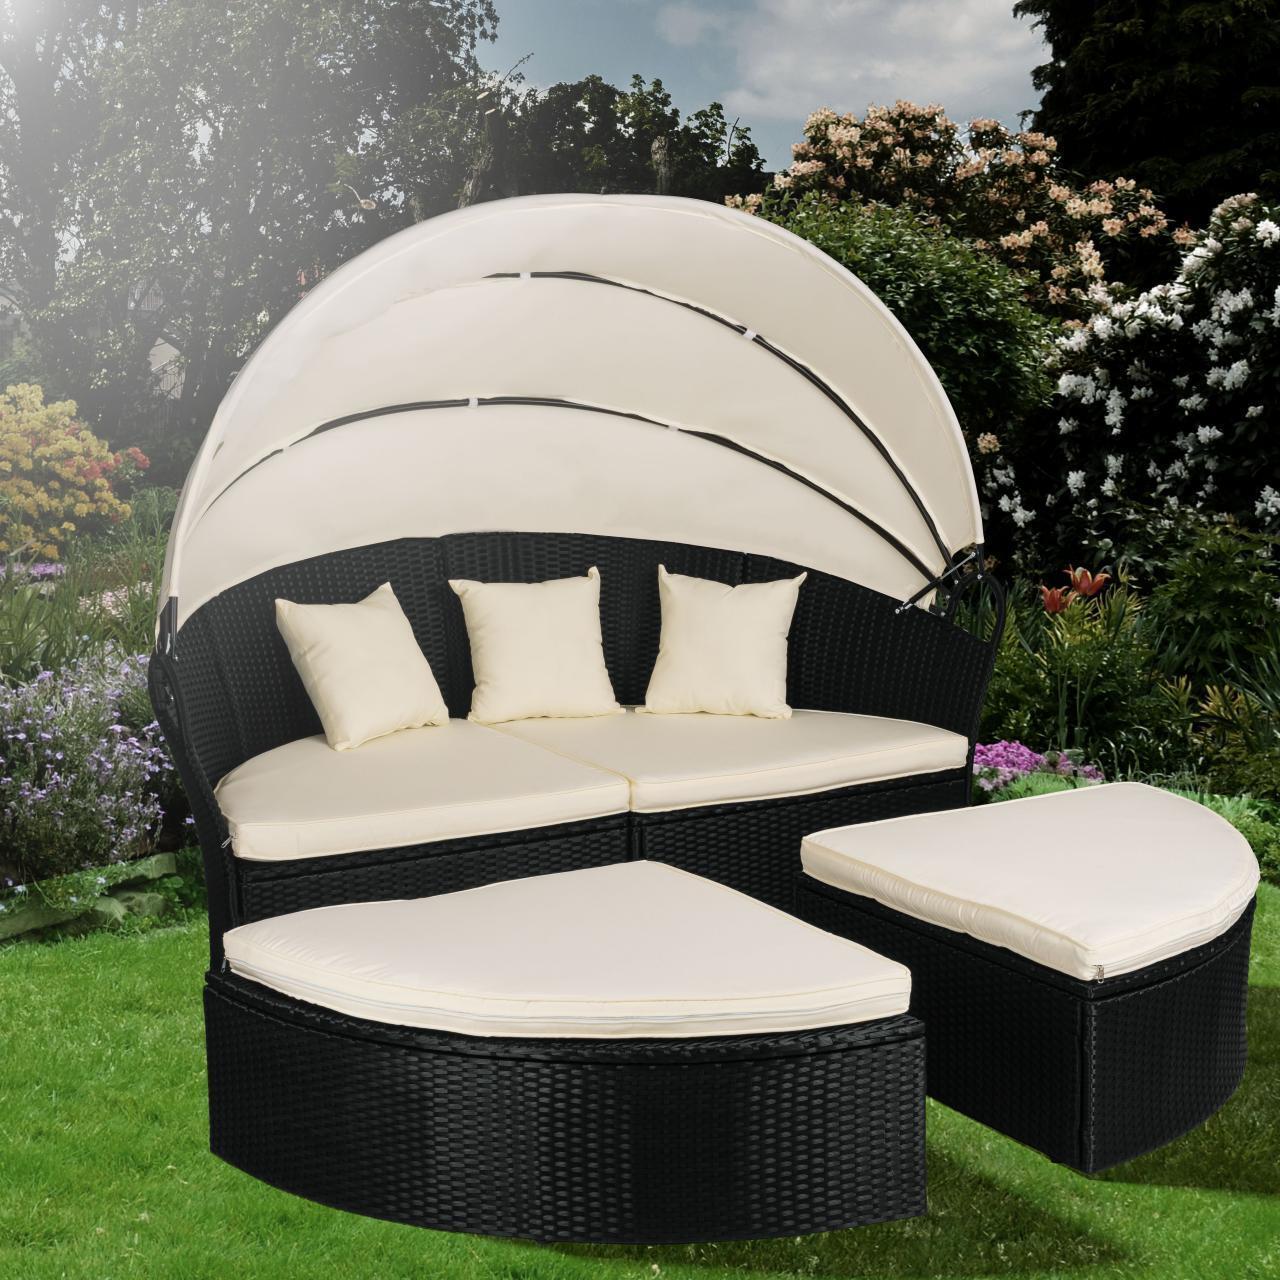 Polyrattan Sonneninsel Sonnenliege Gartenmöbel Gartenmöbel